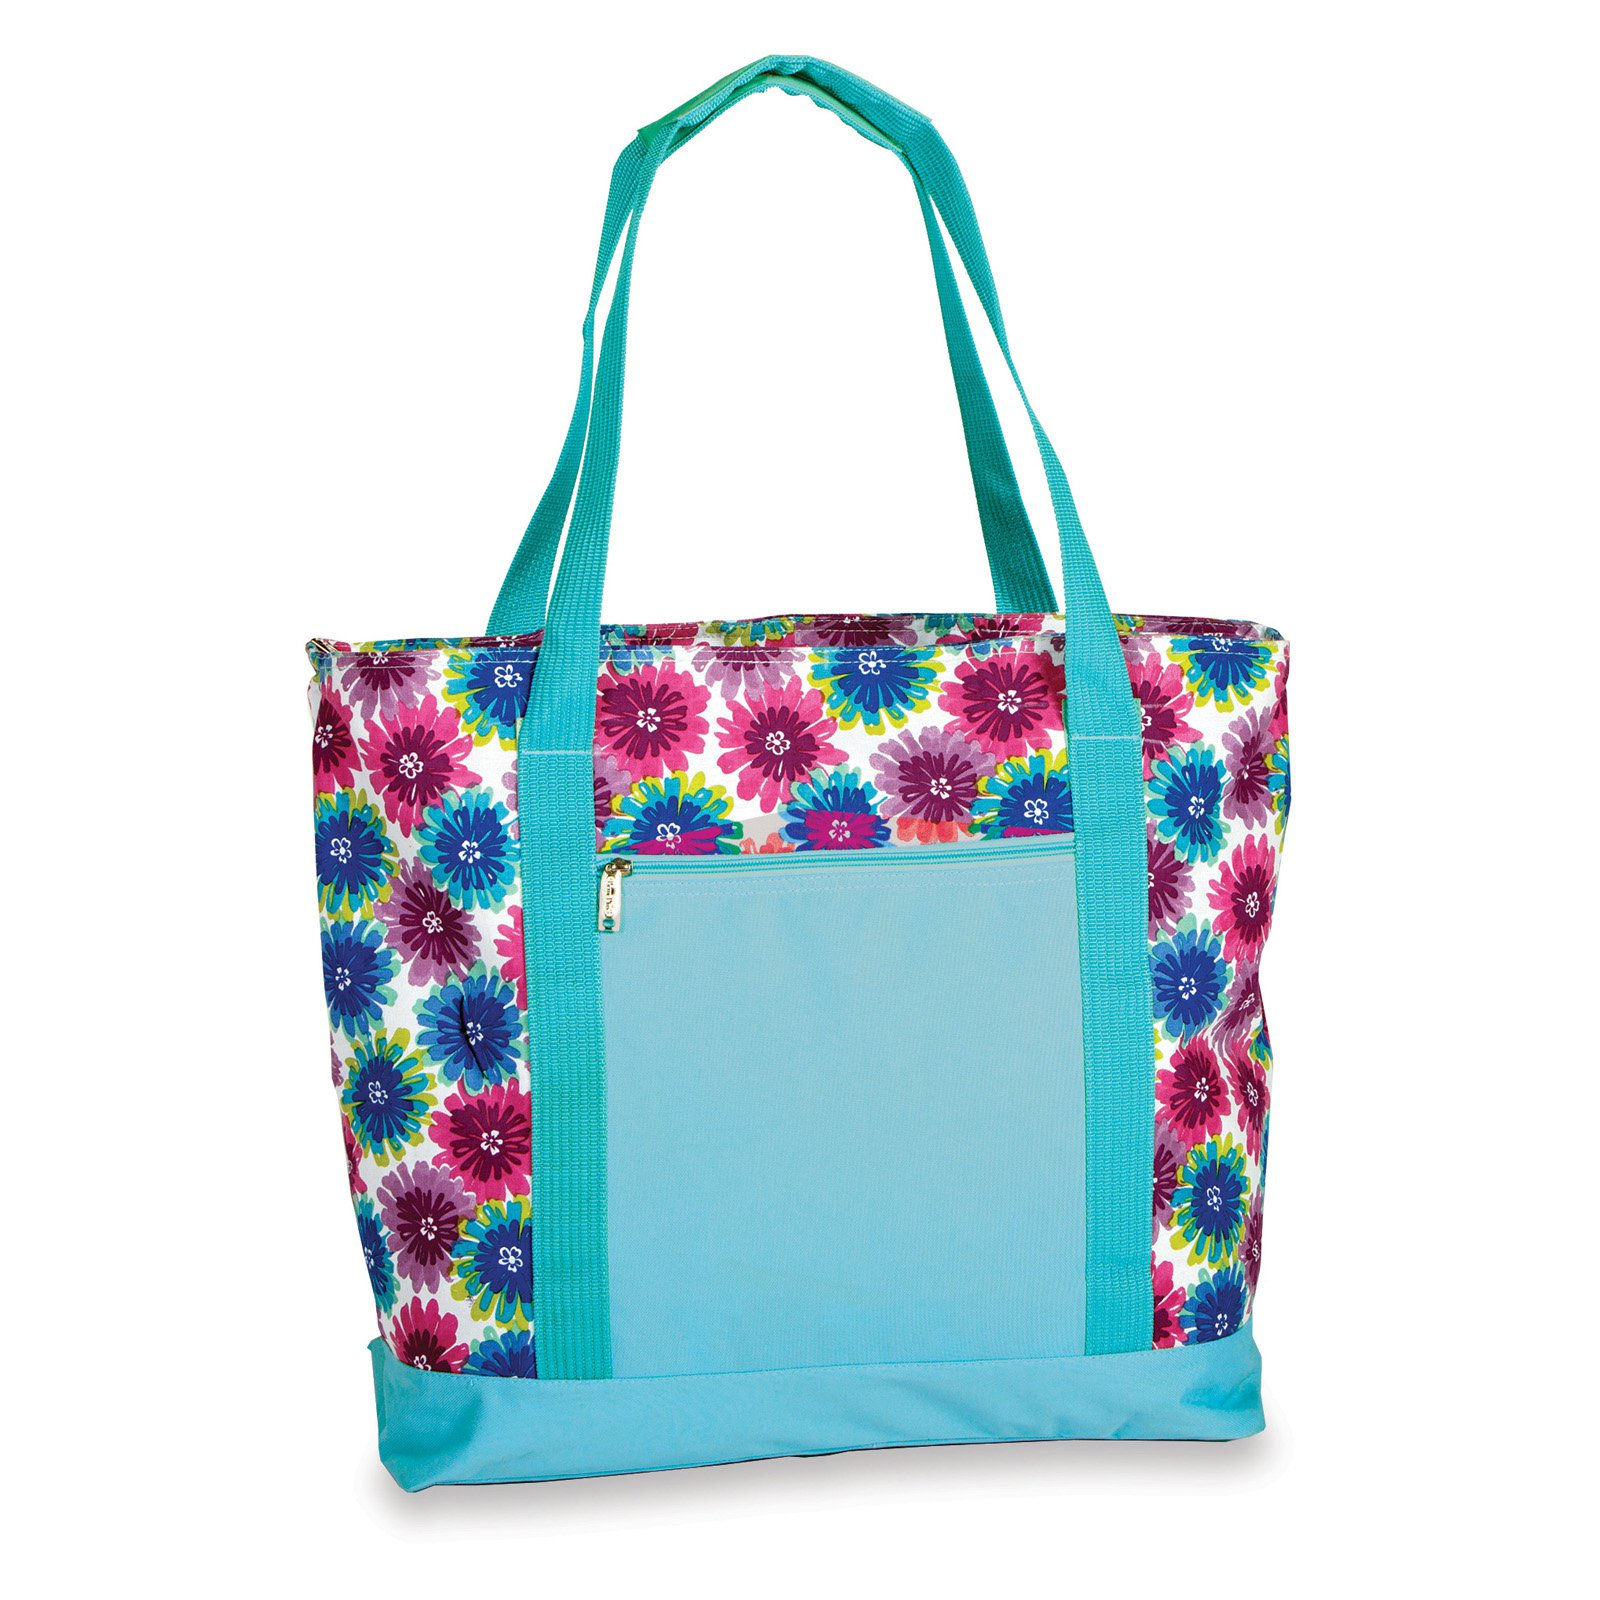 Picnic Plus LIDO 2 in 1 Cooler Bag - Blue Blossom